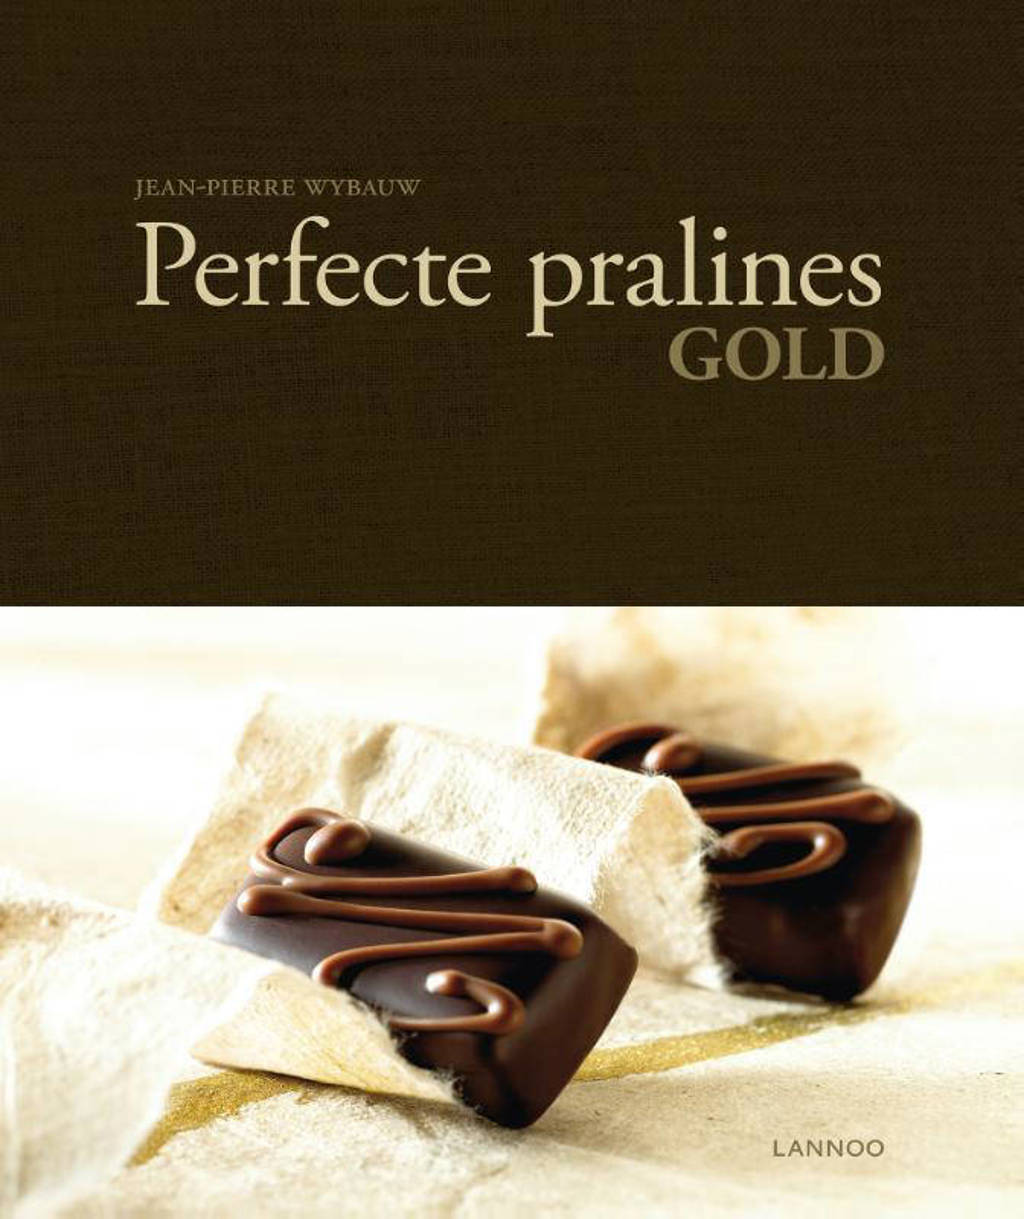 Perfecte pralines - Jean-Pierre Wybauw